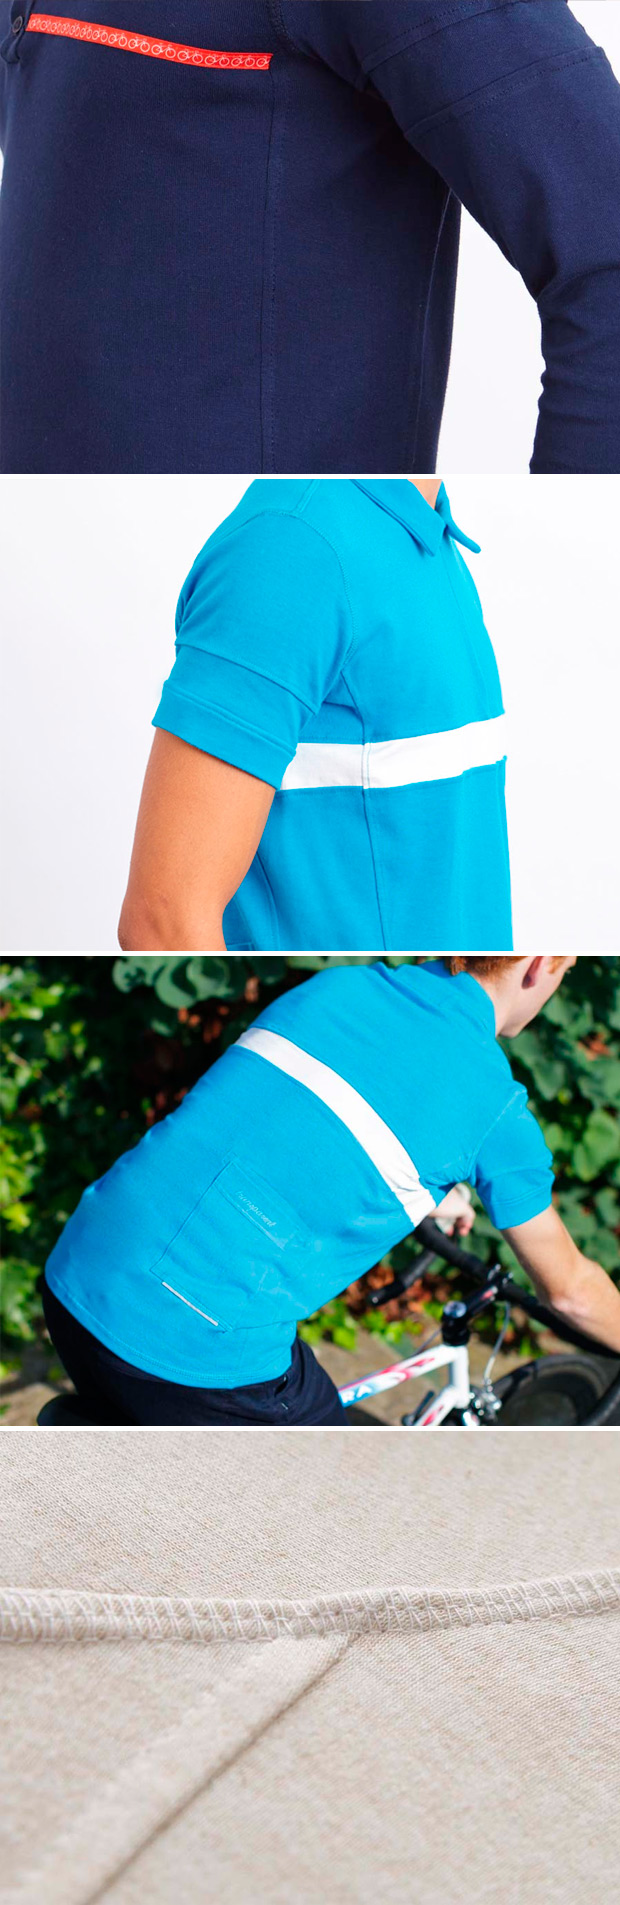 Transparent, ropa casual con un 'toque' ciclista